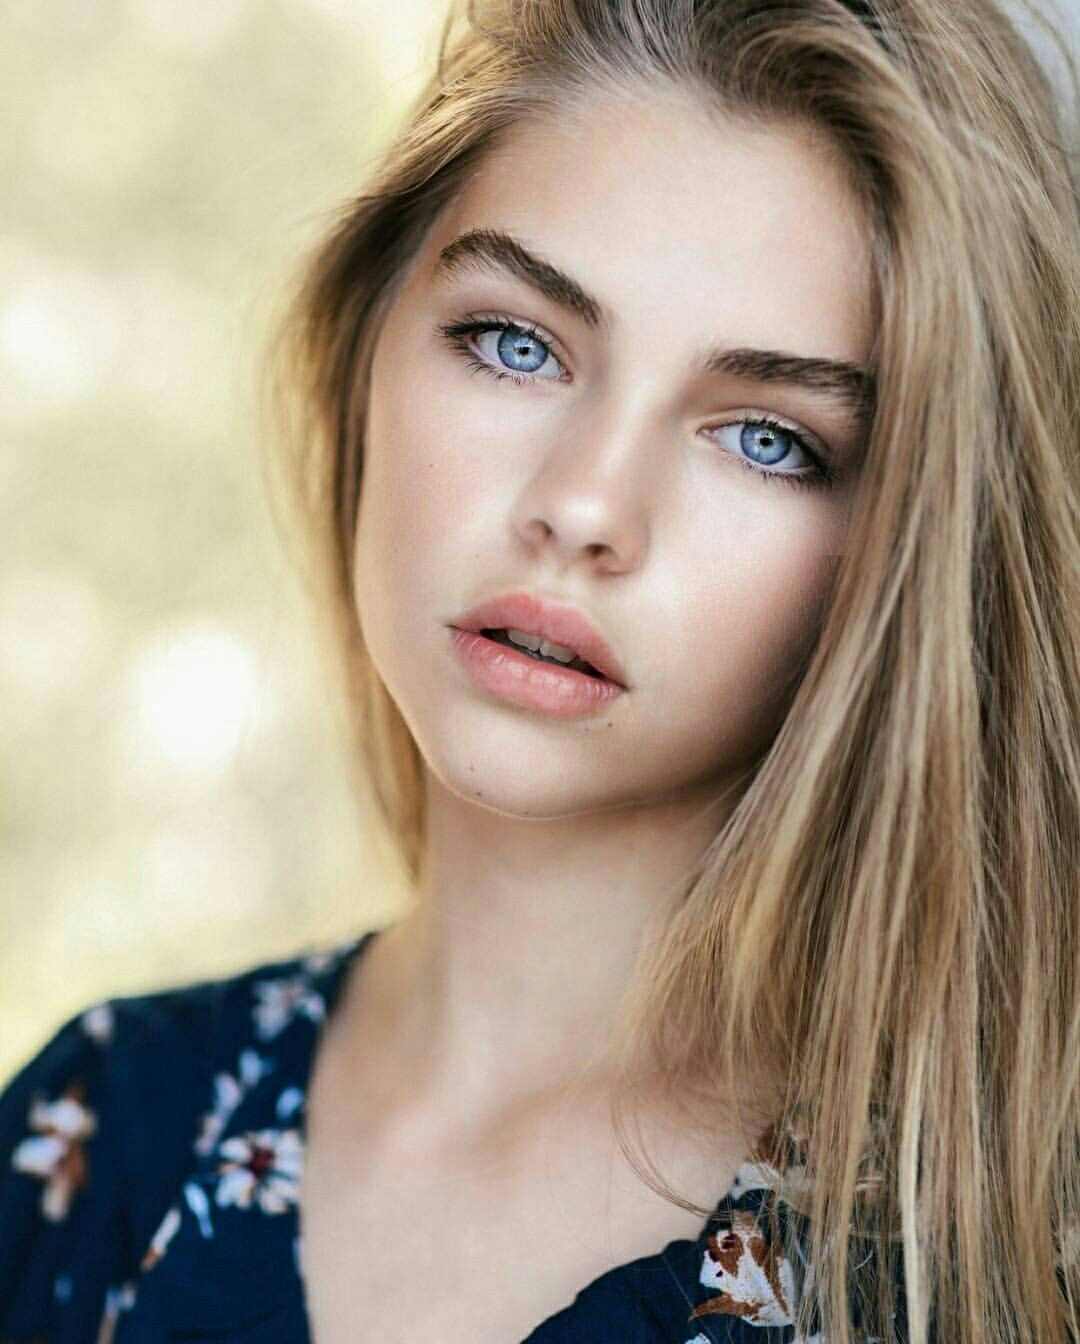 Jade Weber Blonde Hair Blue Eyes Blonde Hair Blue Eyes Blonde With Blue Eyes Pretty Blonde Girls